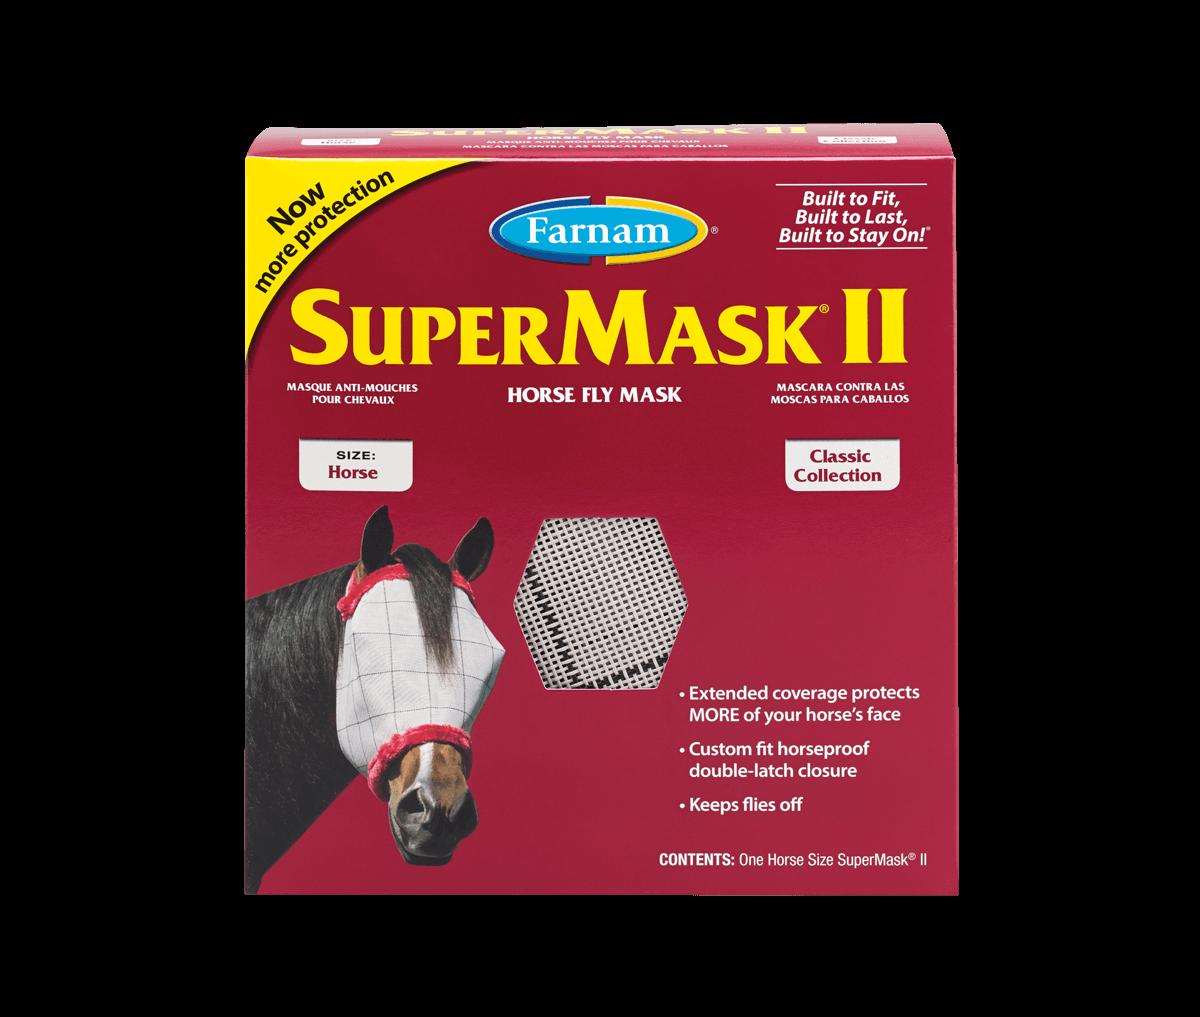 SuperMask II - Horse Fly Mask